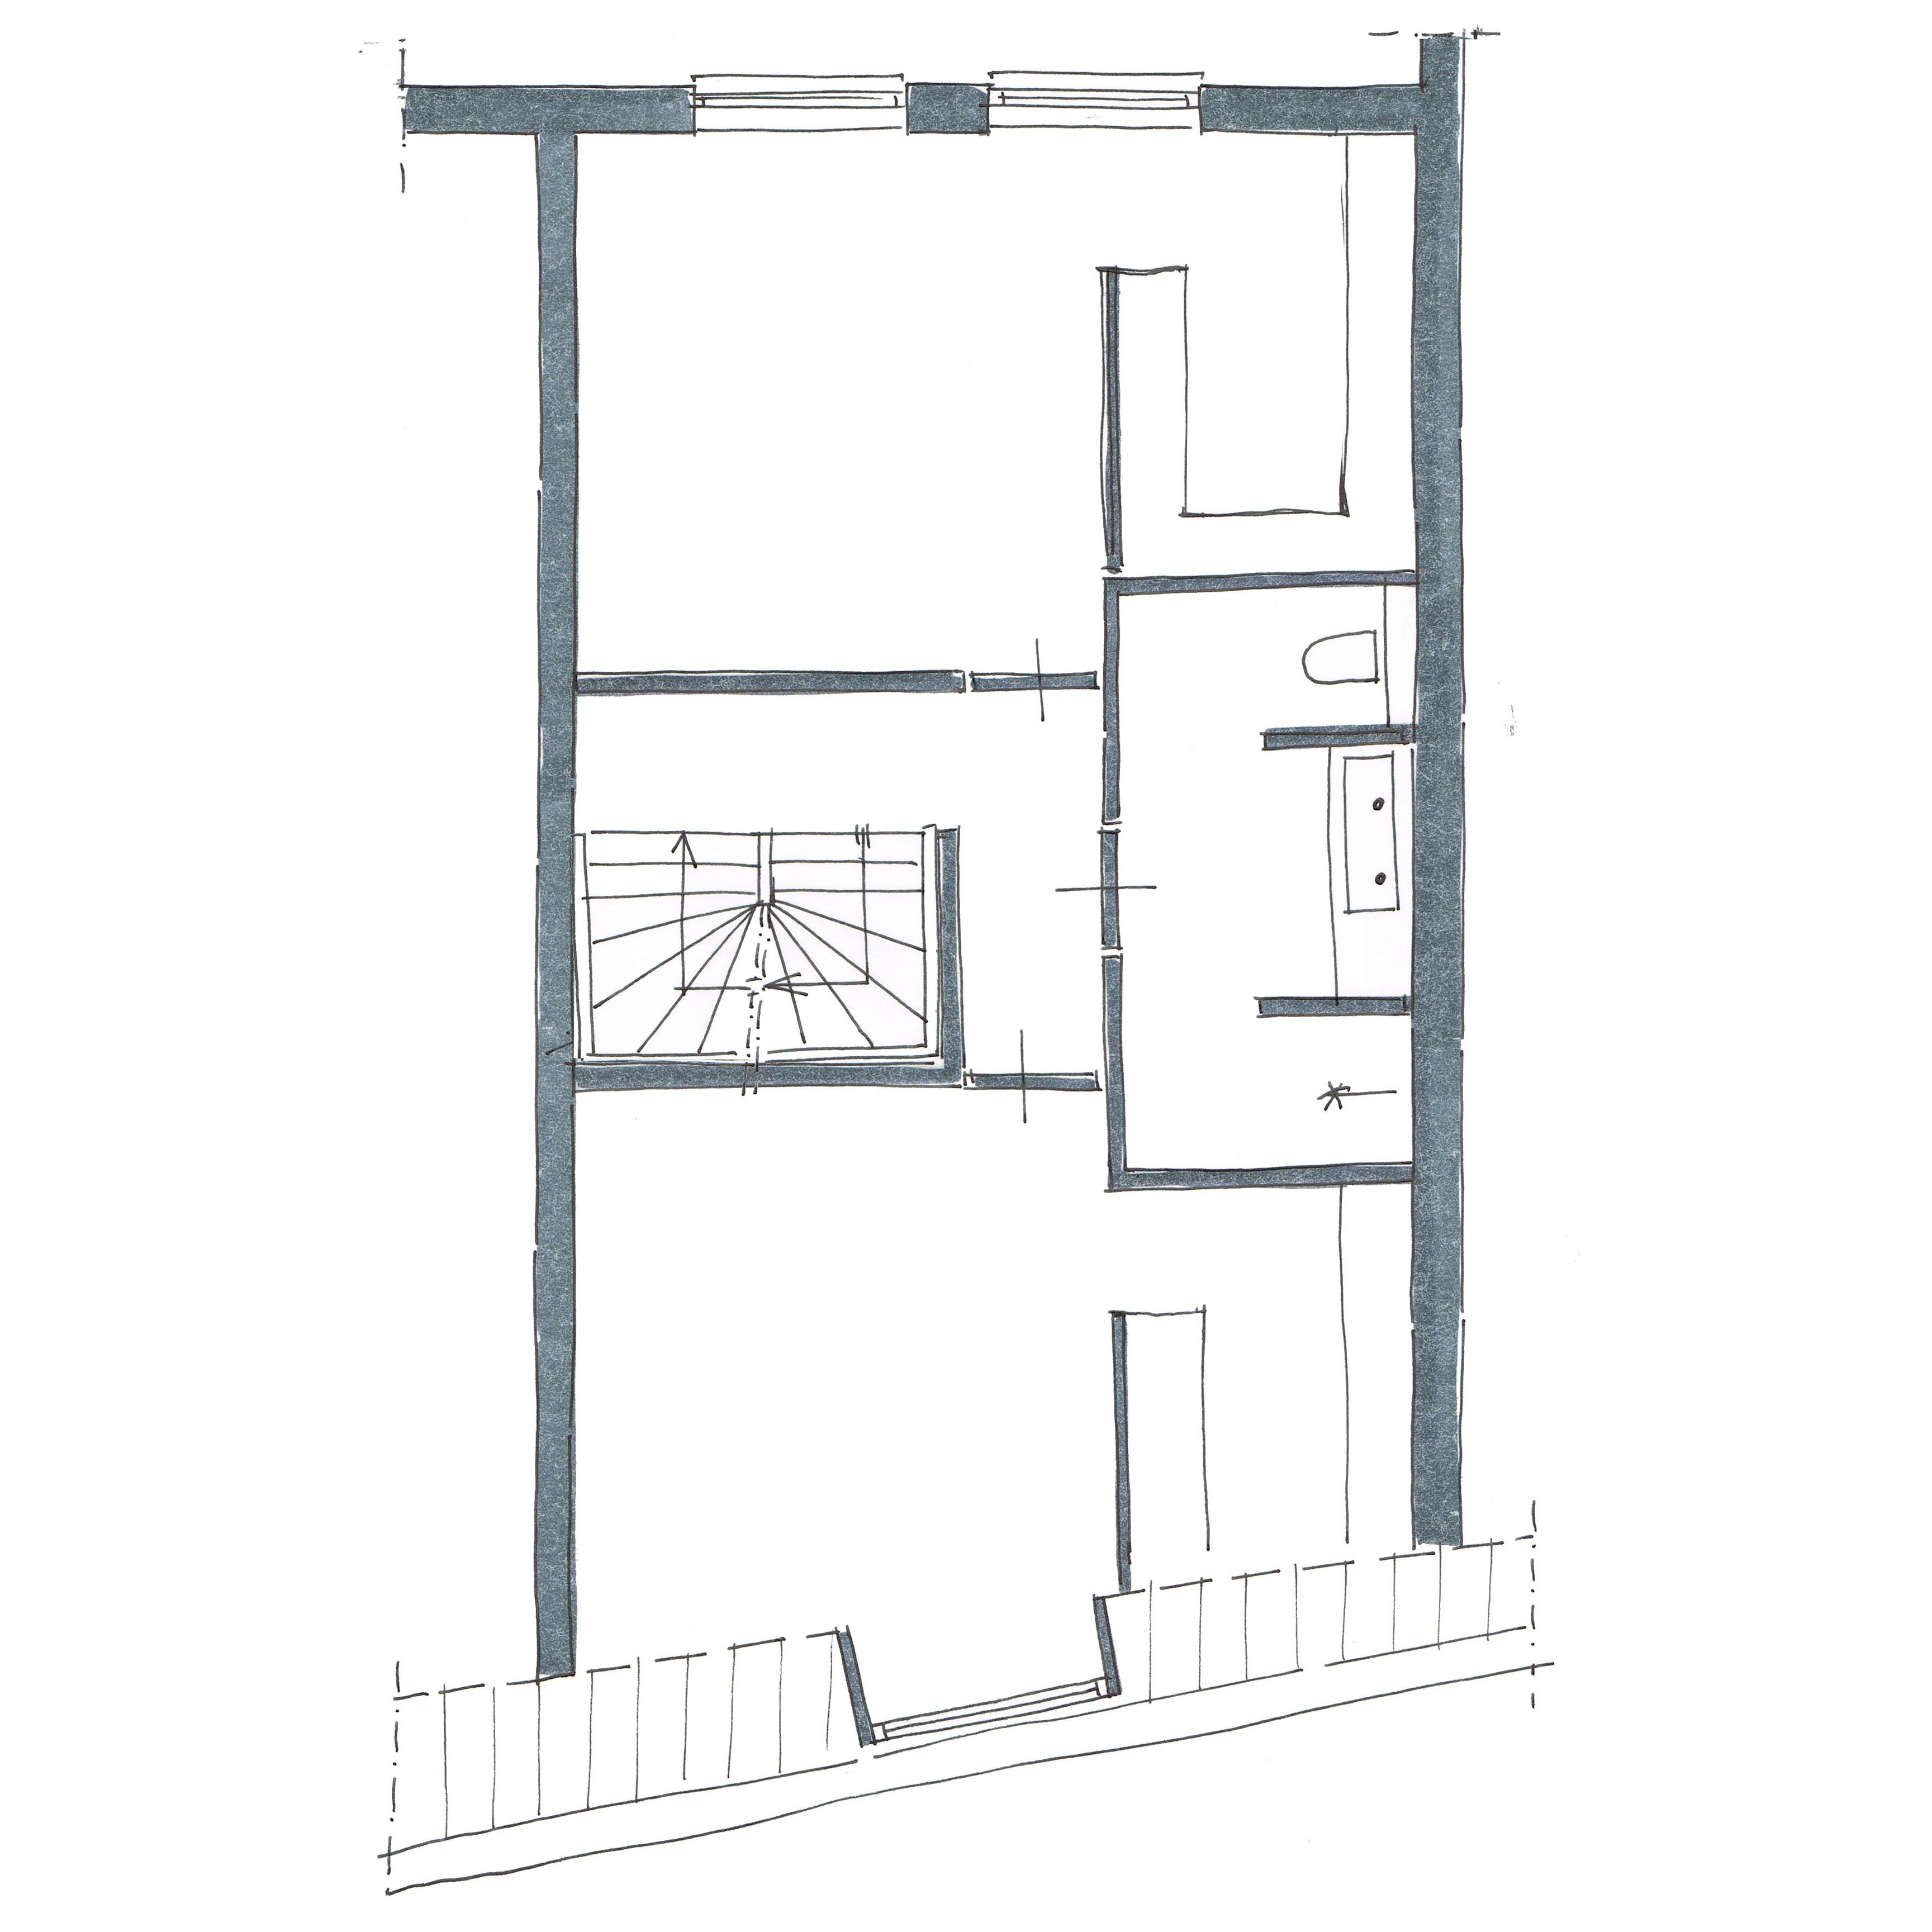 stoel_architect_kampen_stoelaantafel (7)